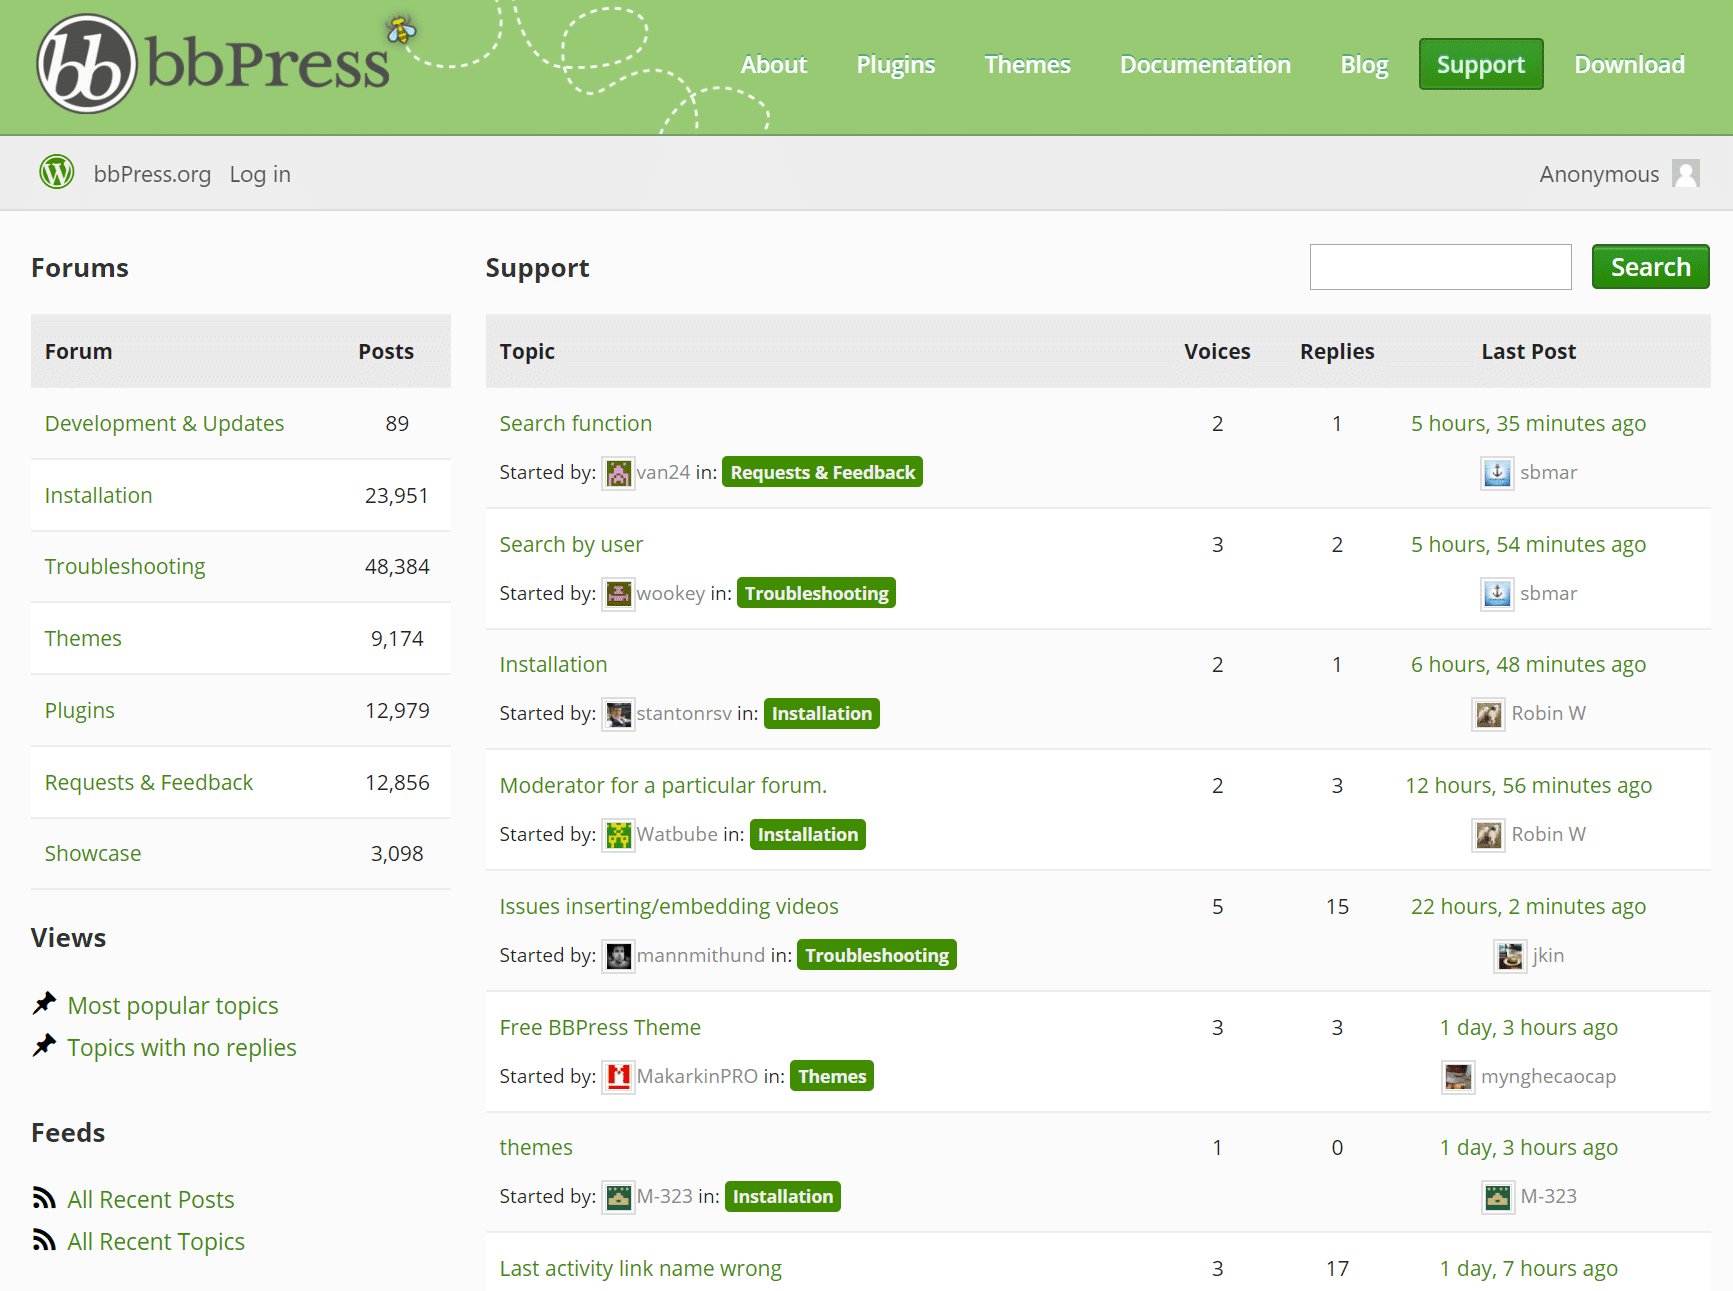 WordPressのフォーラムbbPressの例